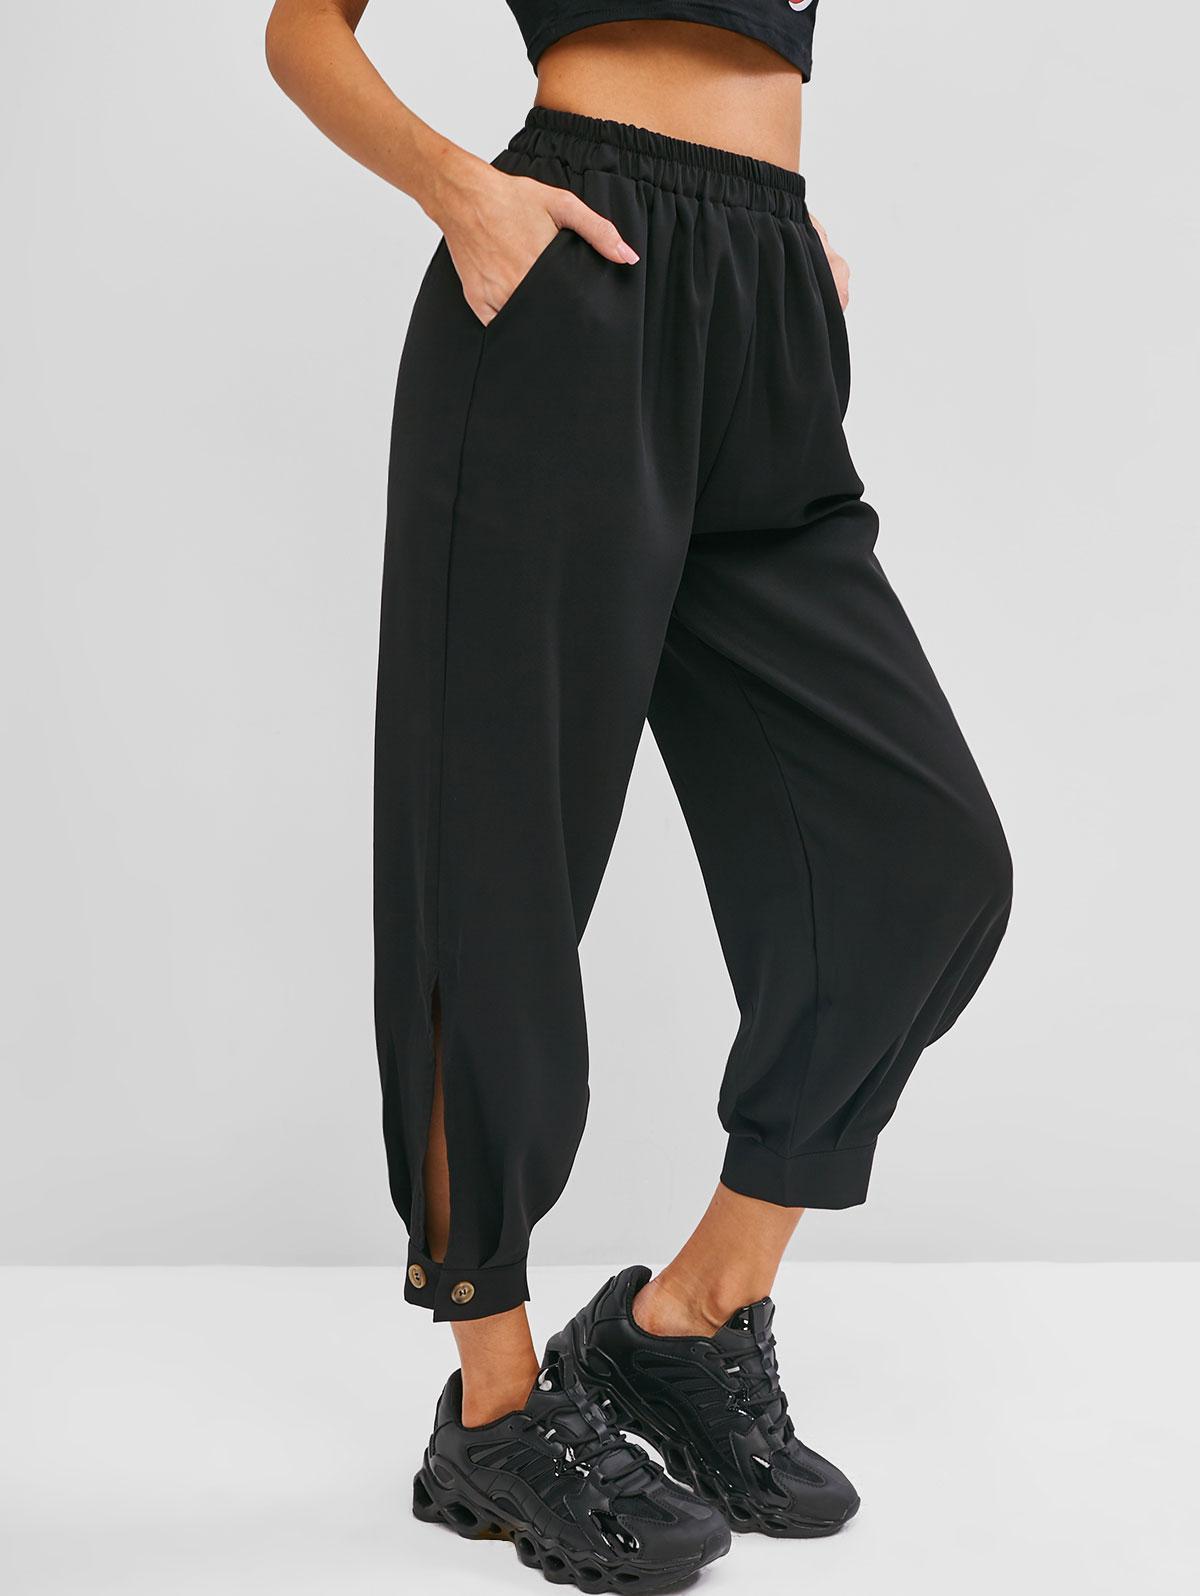 Button Cuff Pocket High Rise Pants